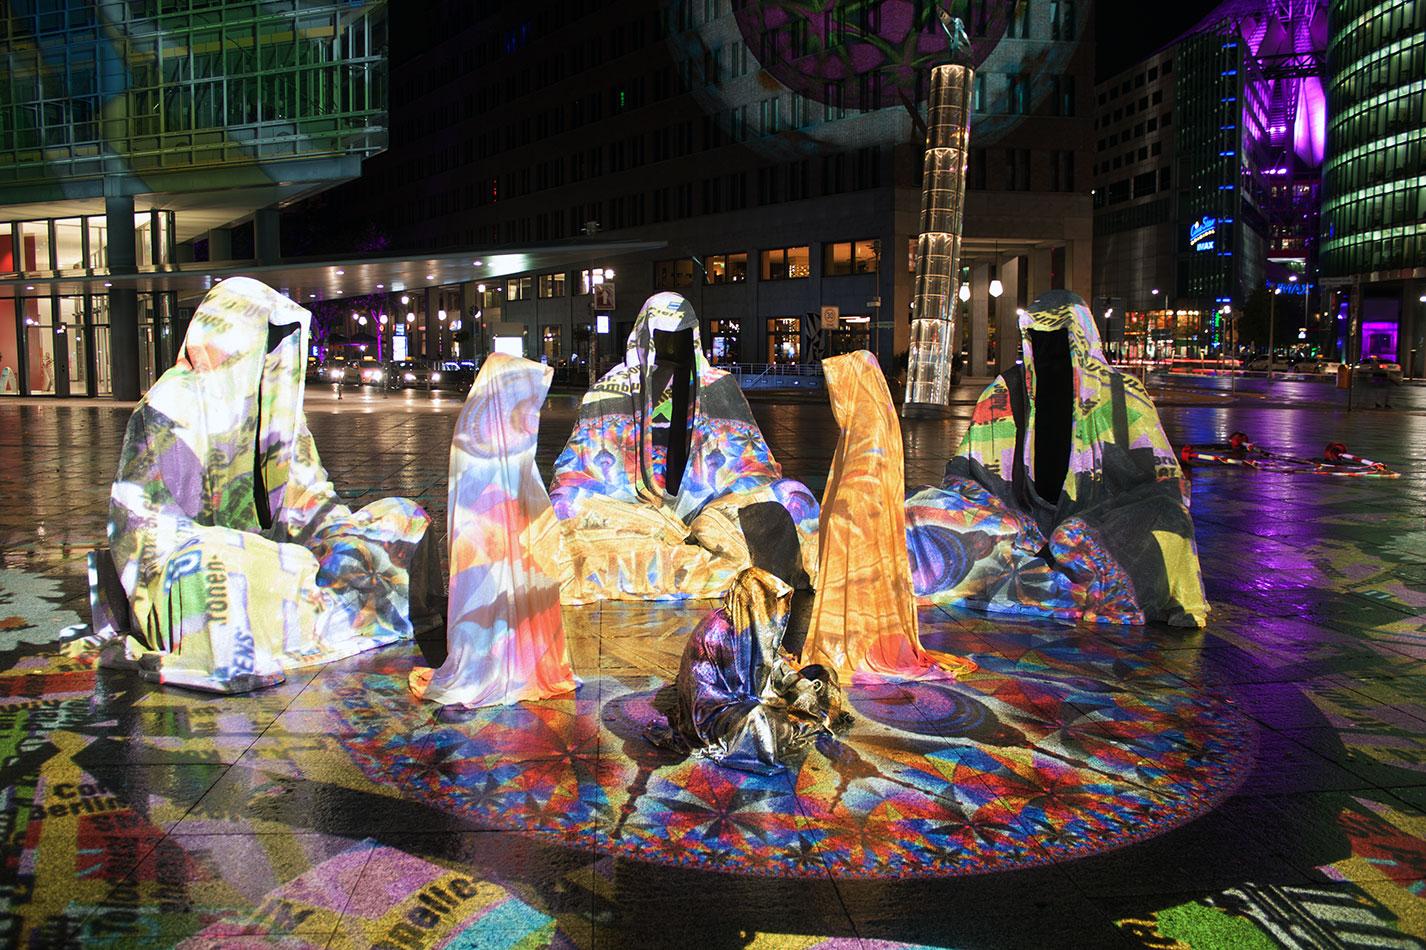 festival-of-lights-berlin-light-art-festival-contemporary-fine-art-design-show-large-scale-sculpture-guardiansof-time-manfred-kili-kielnhofer-sculpture-3875